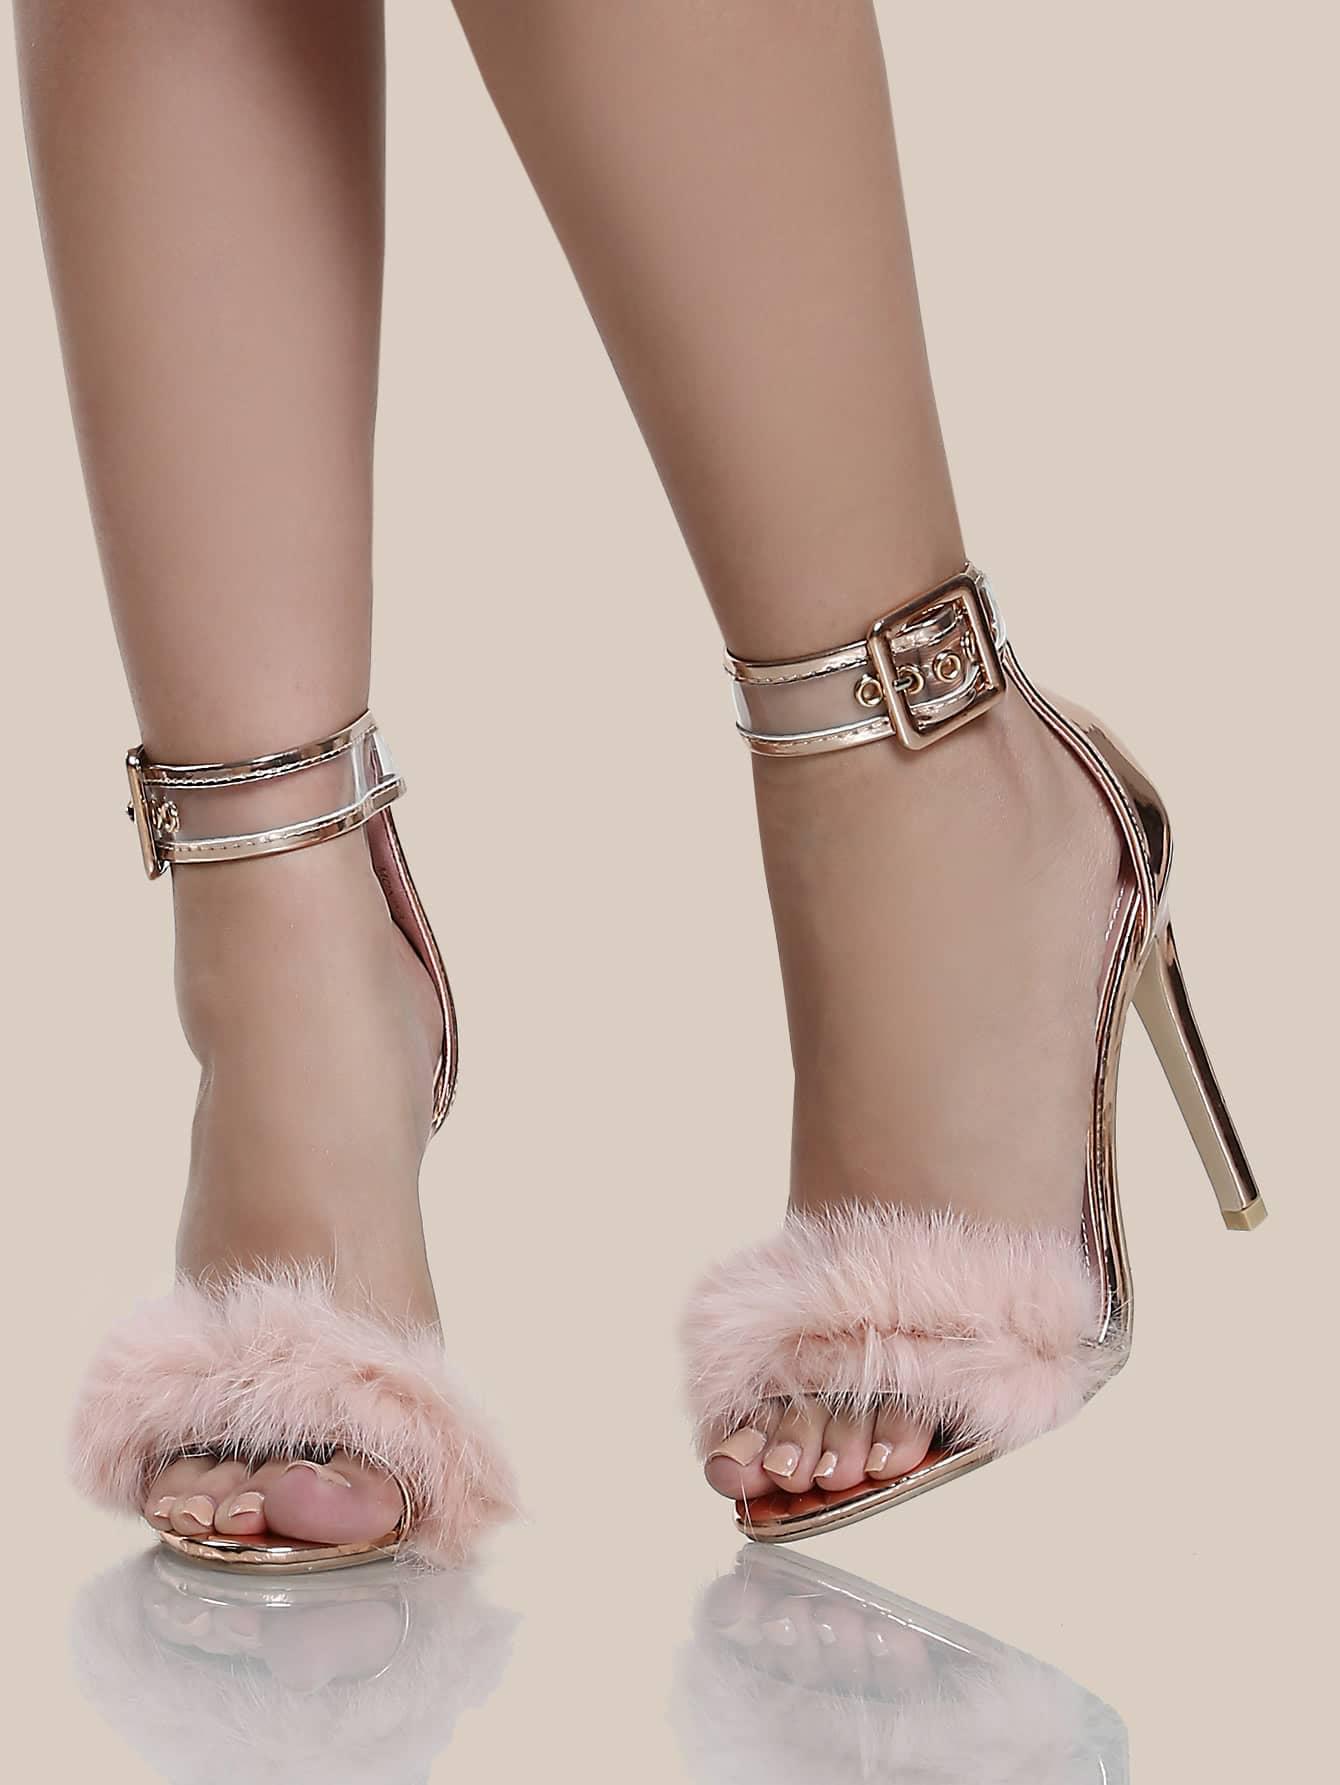 Strap Shoes Pink No Heels